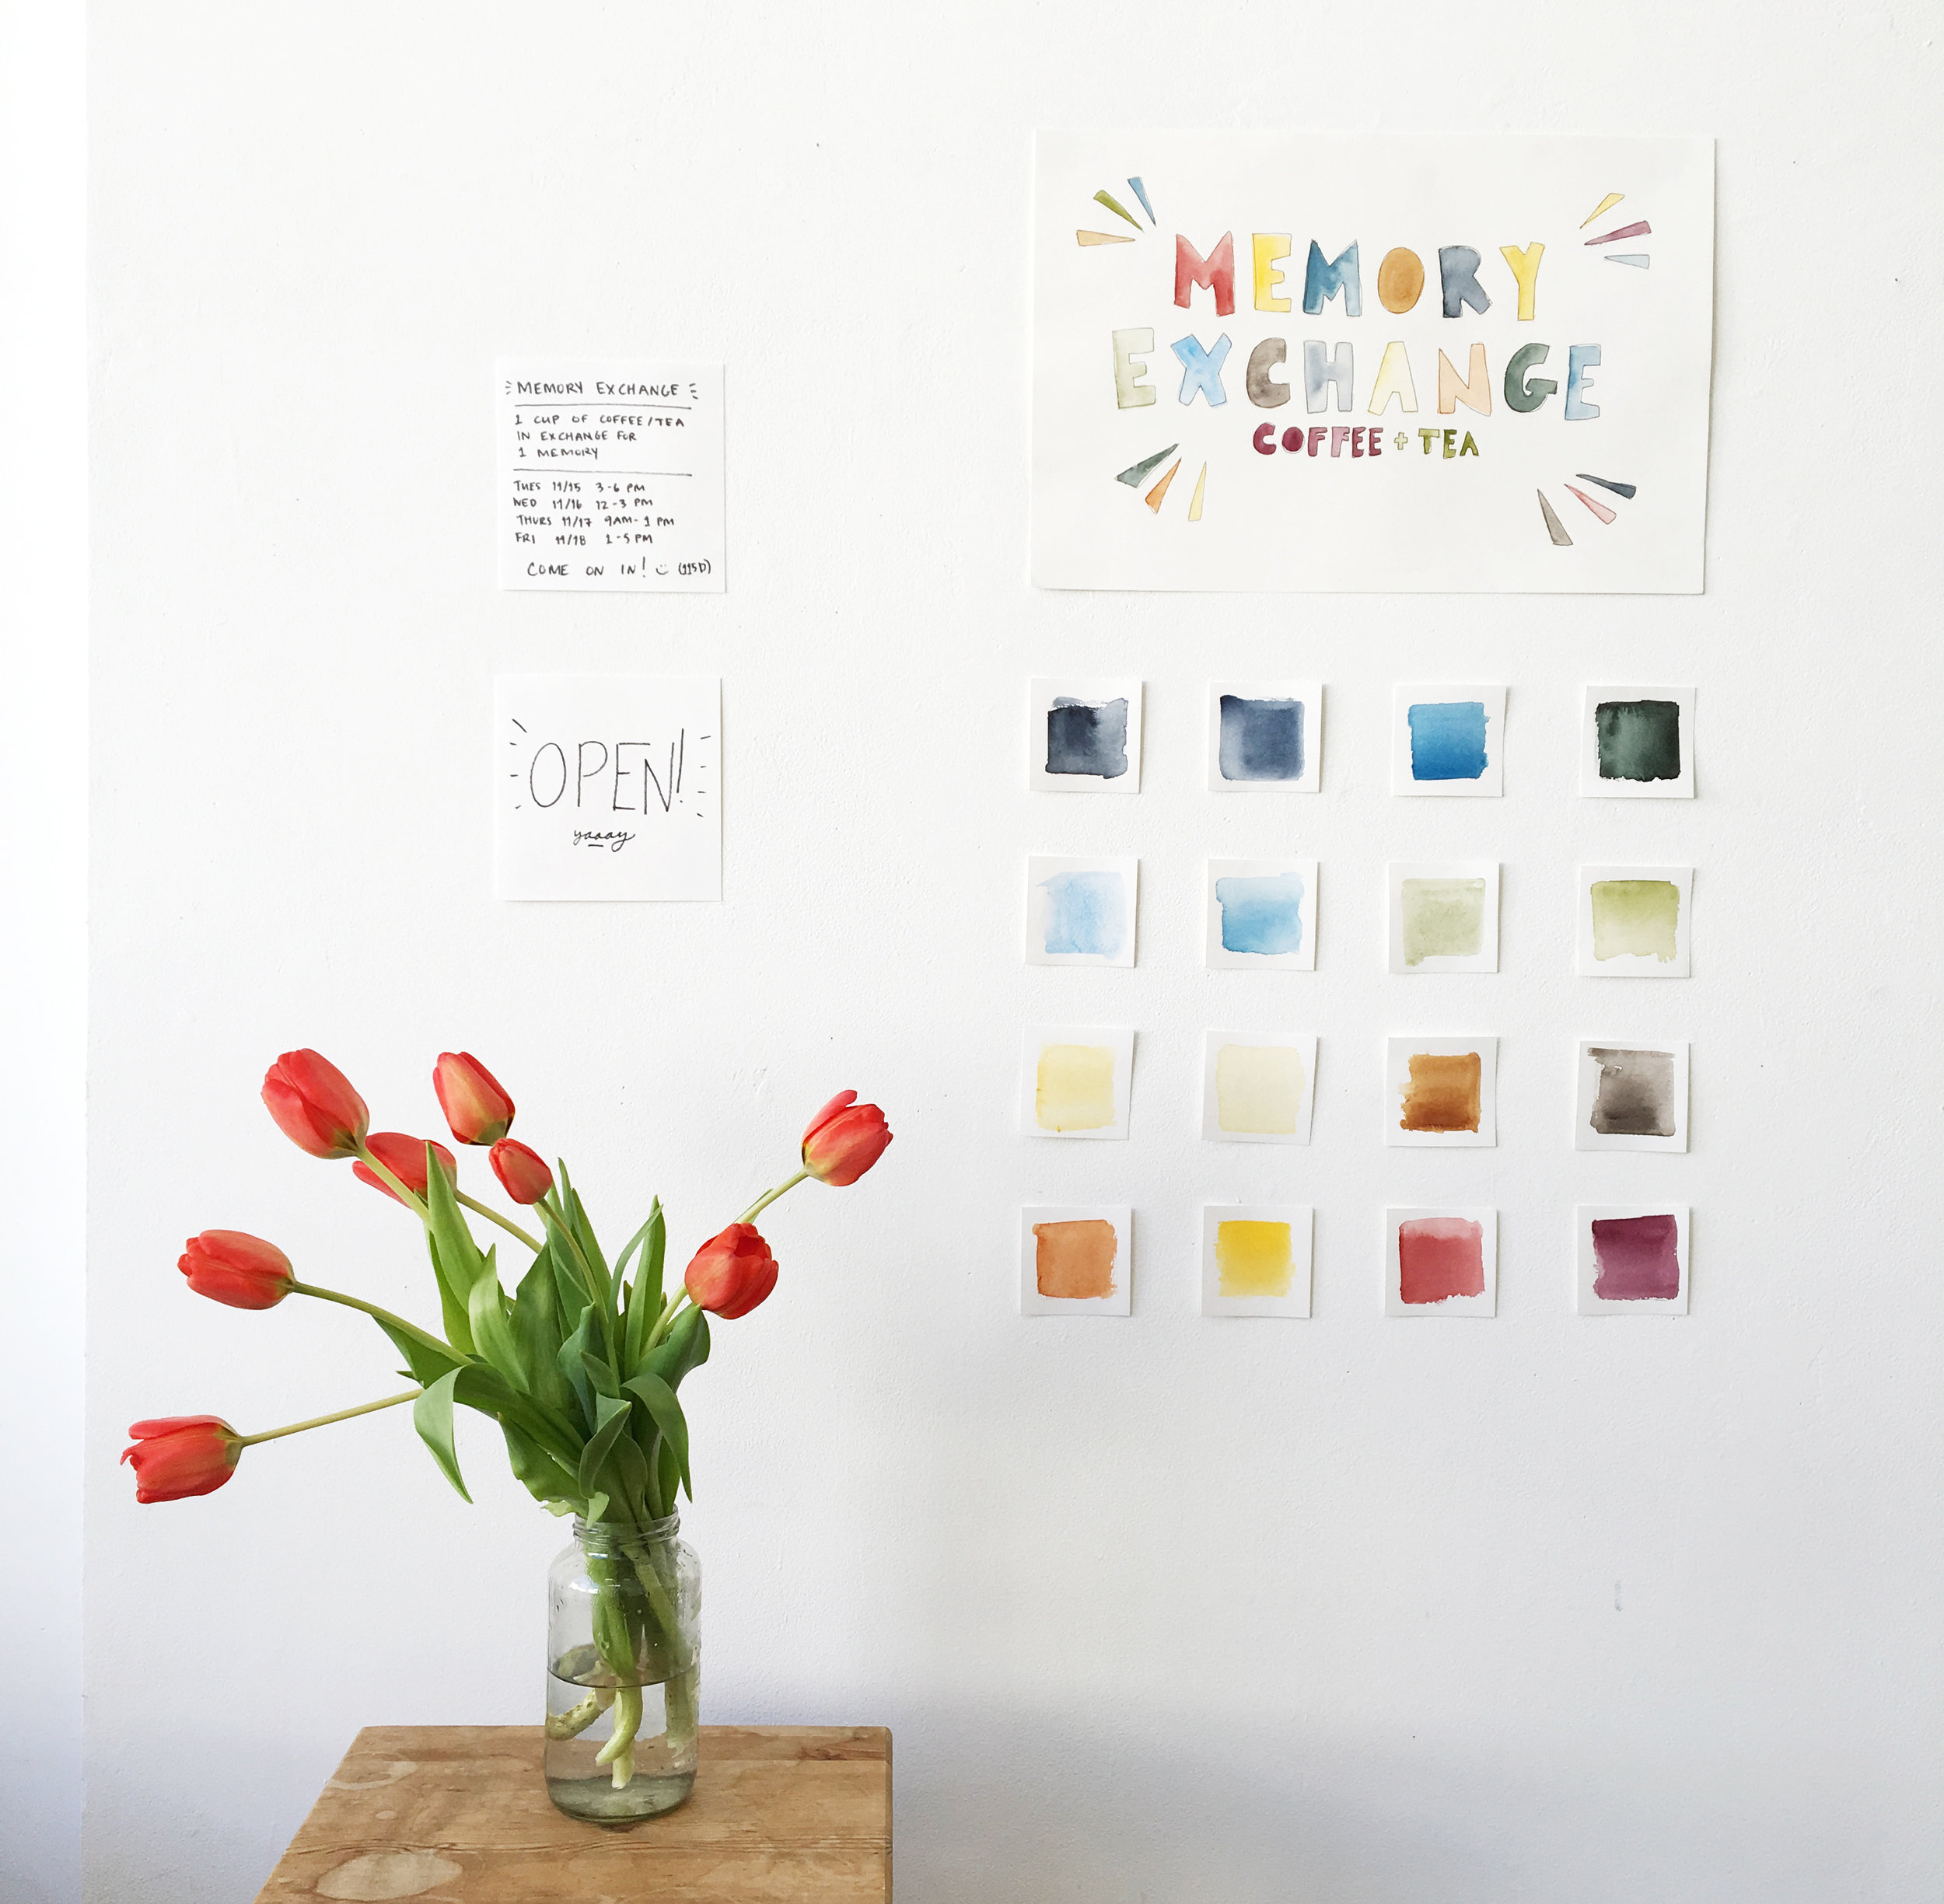 signage_flowers.jpg